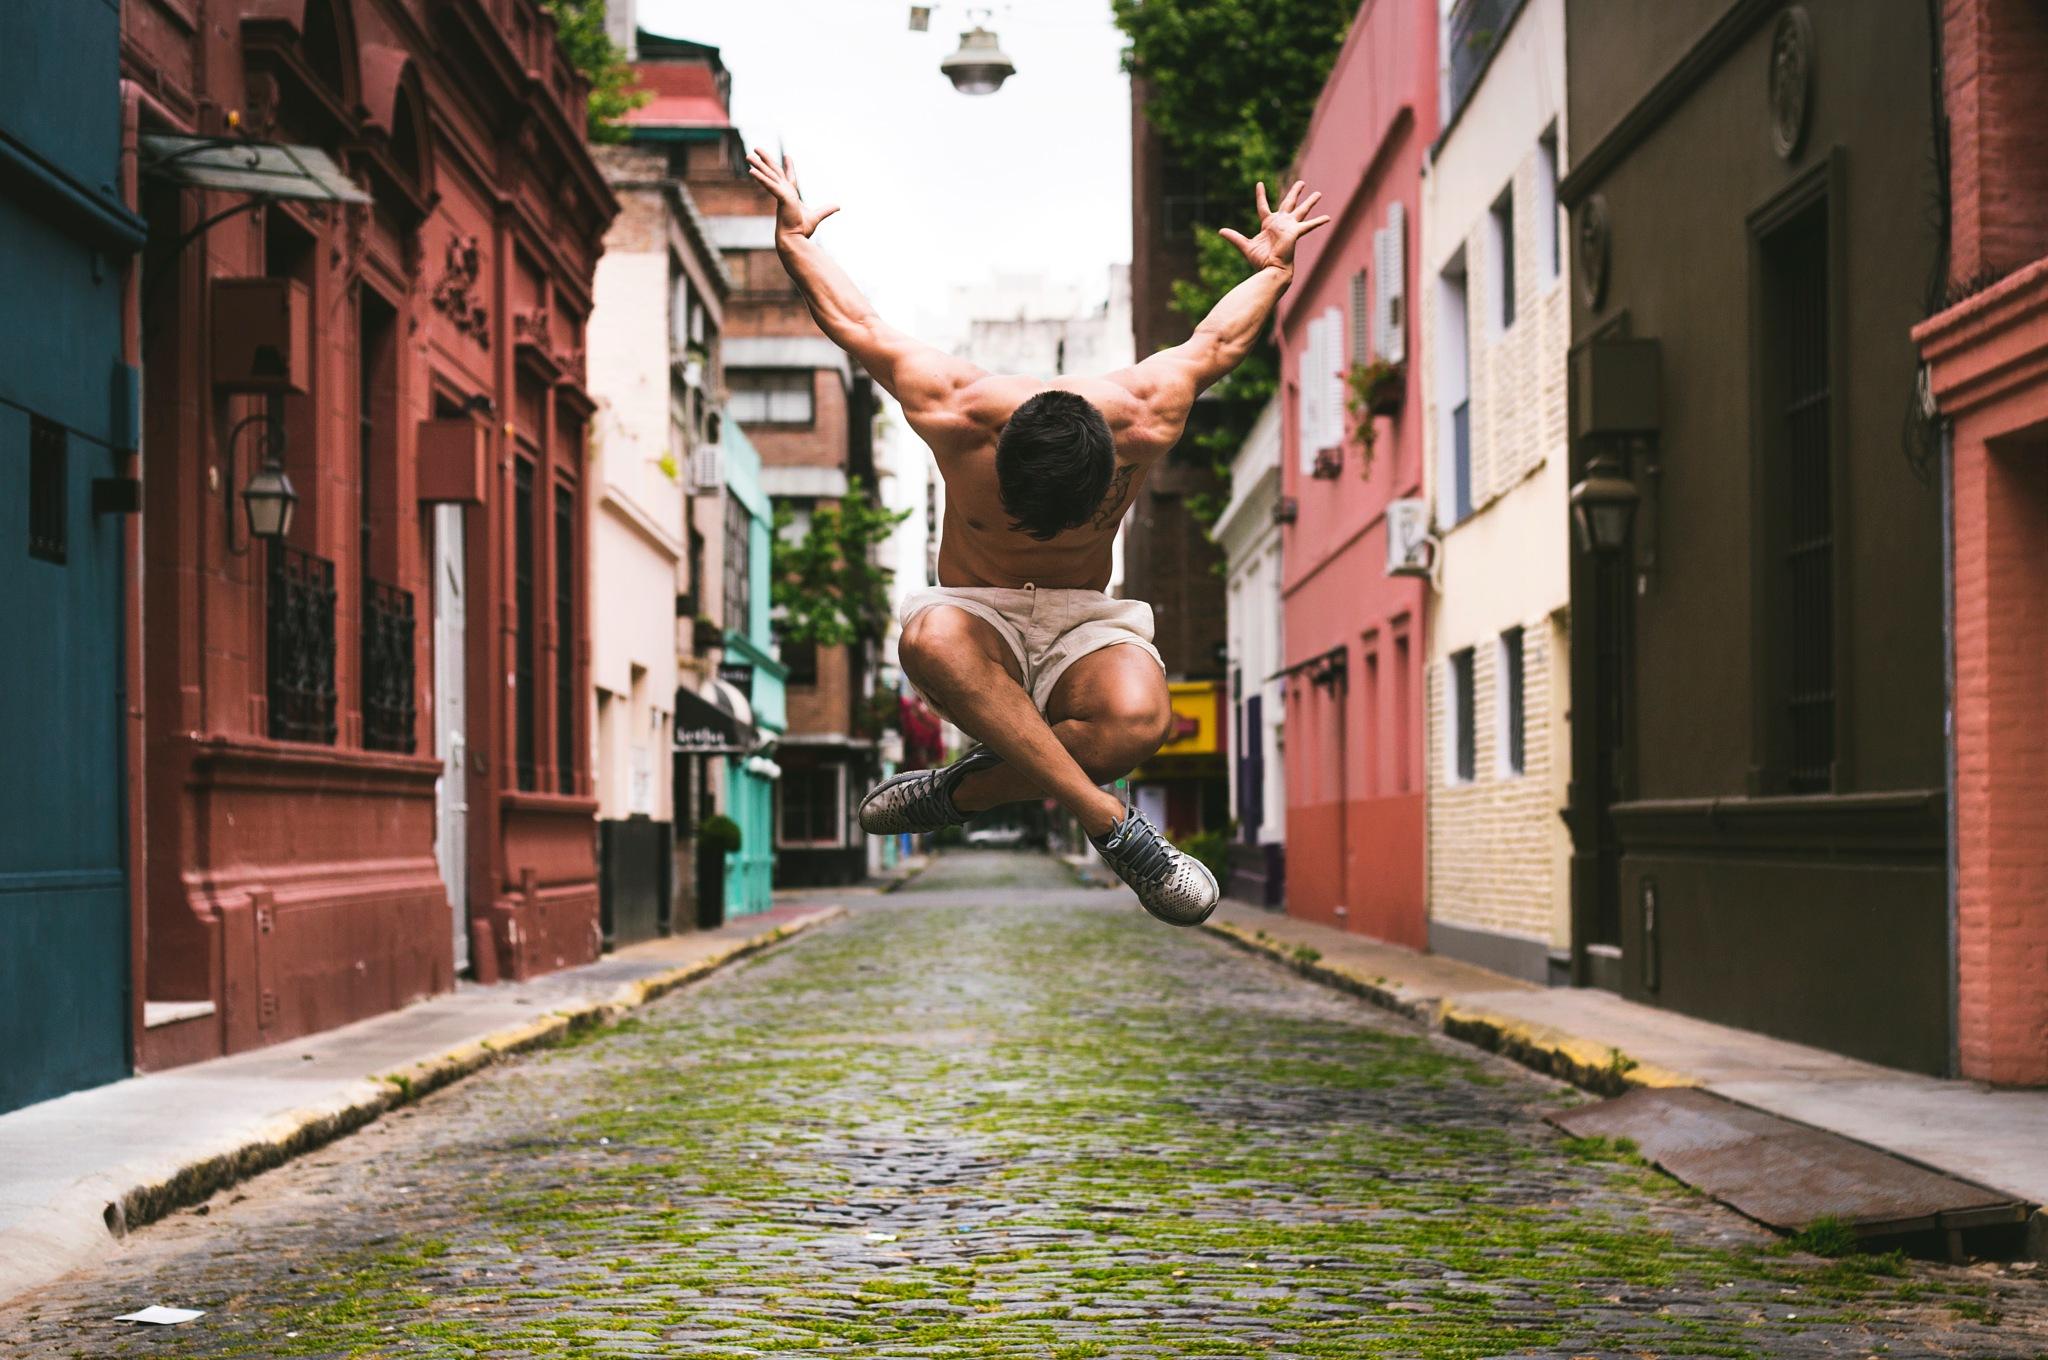 Dancer by Pablo Zamora